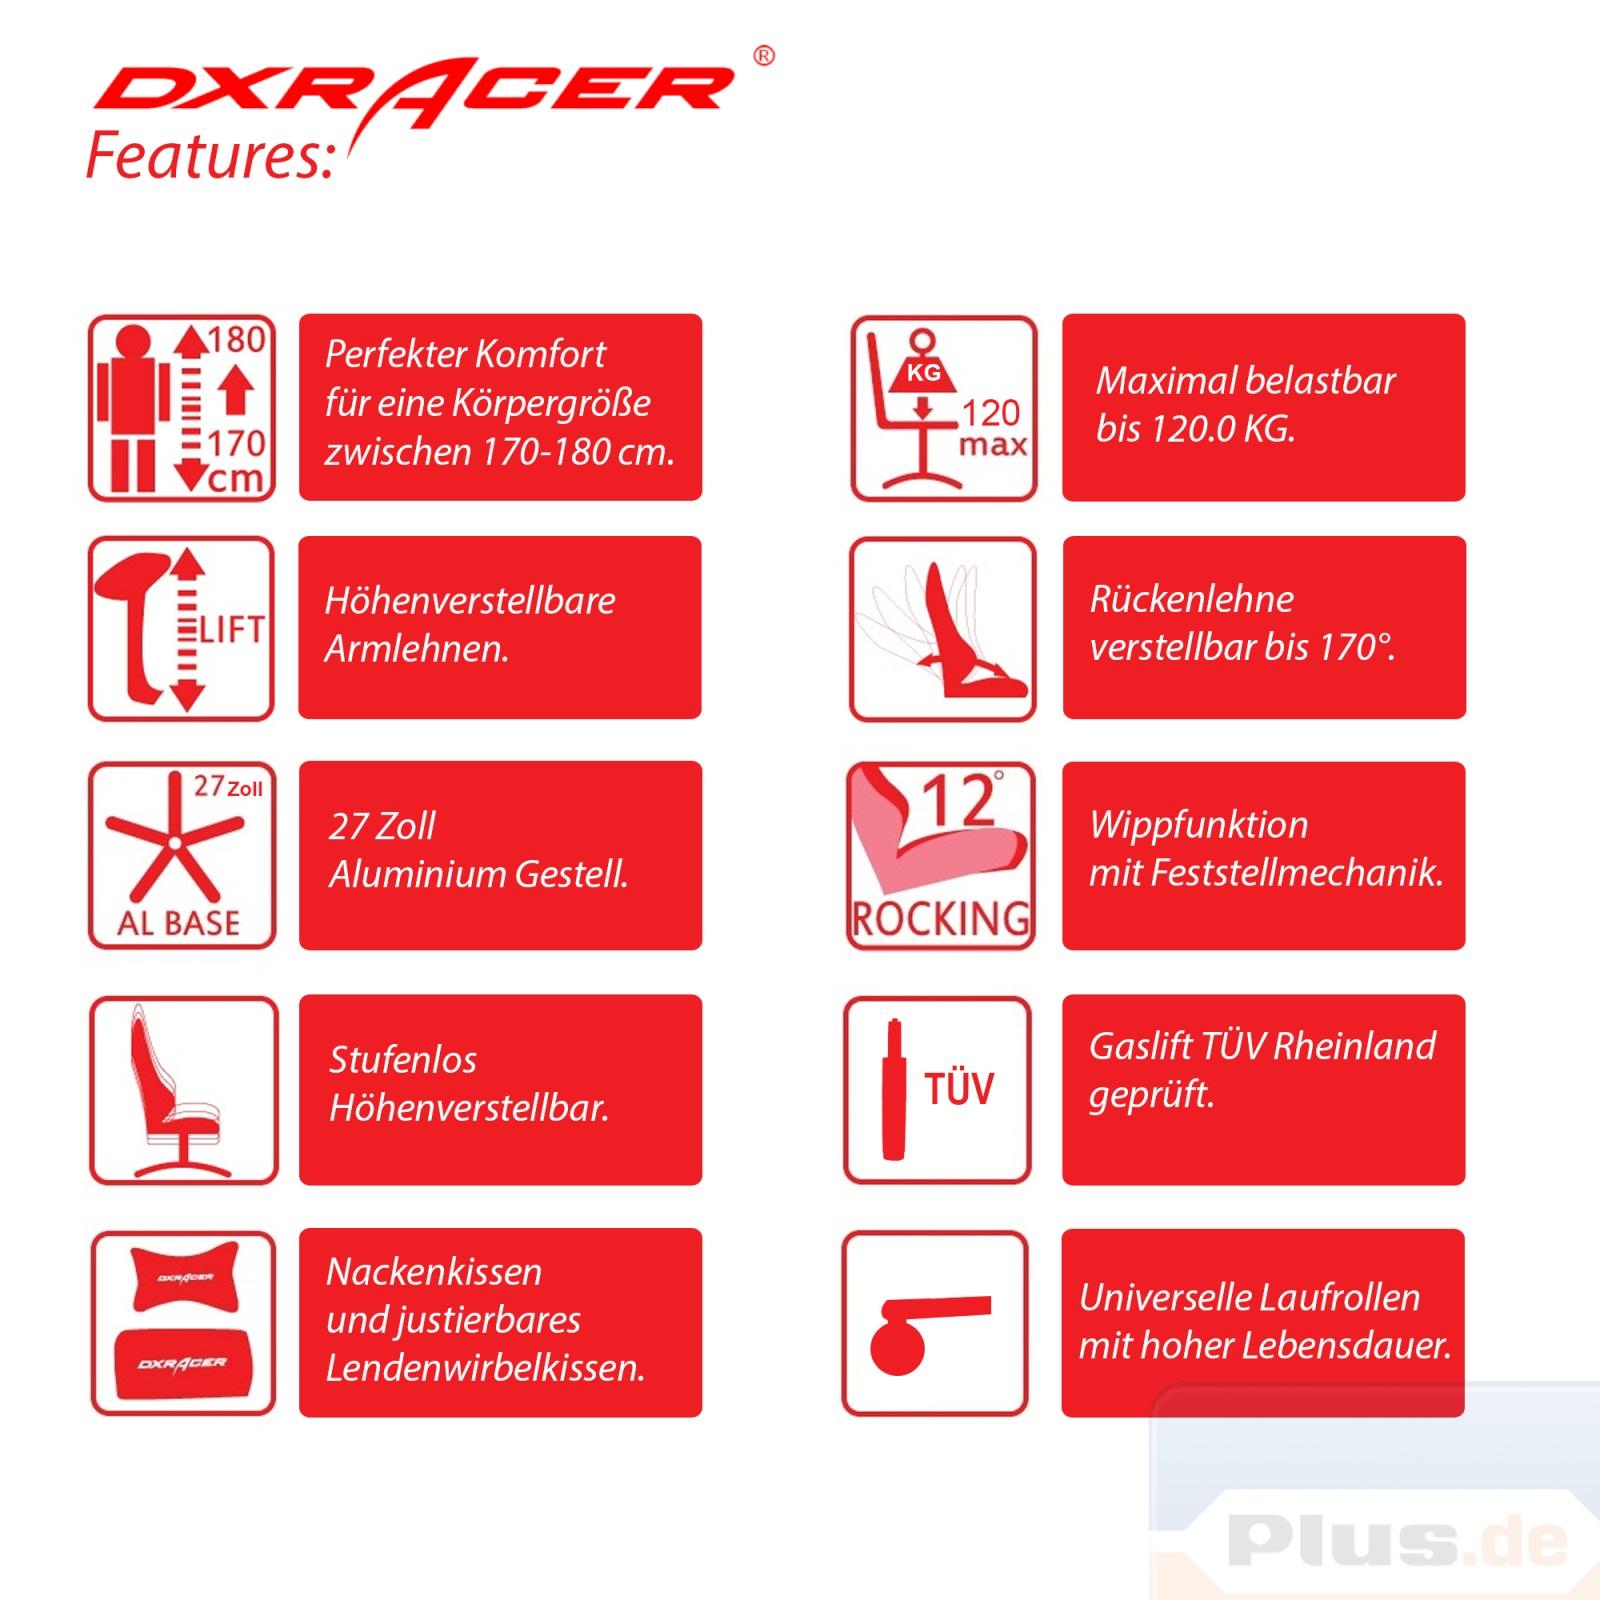 dxracer 3 b rostuhl drehstuhl design top kaufen auf. Black Bedroom Furniture Sets. Home Design Ideas